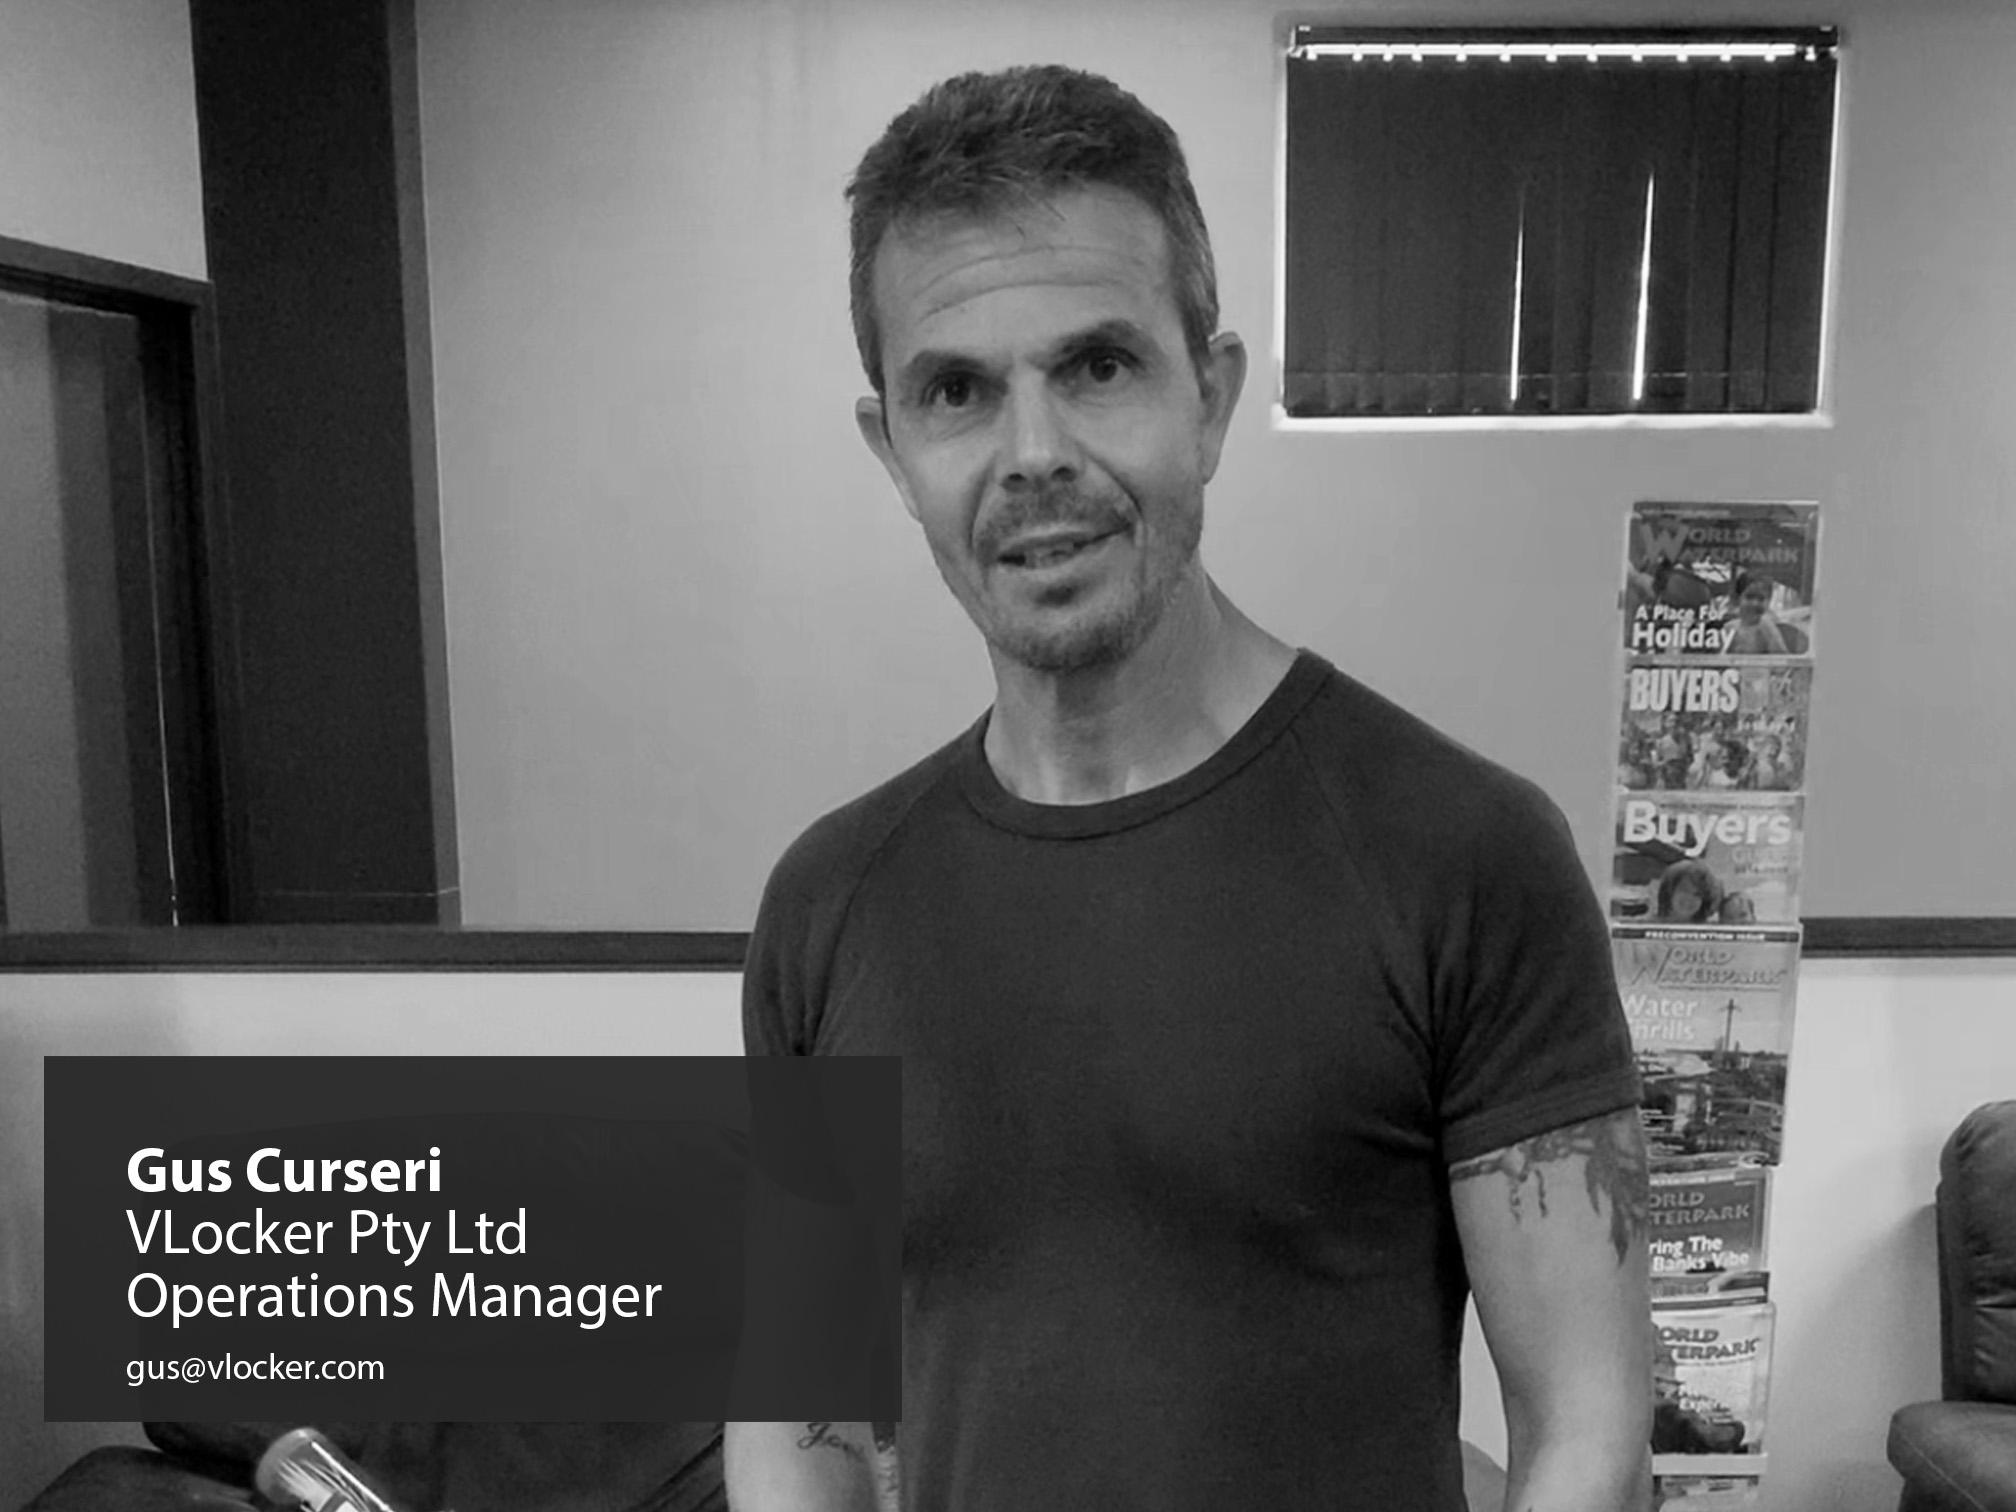 Gus Curseri